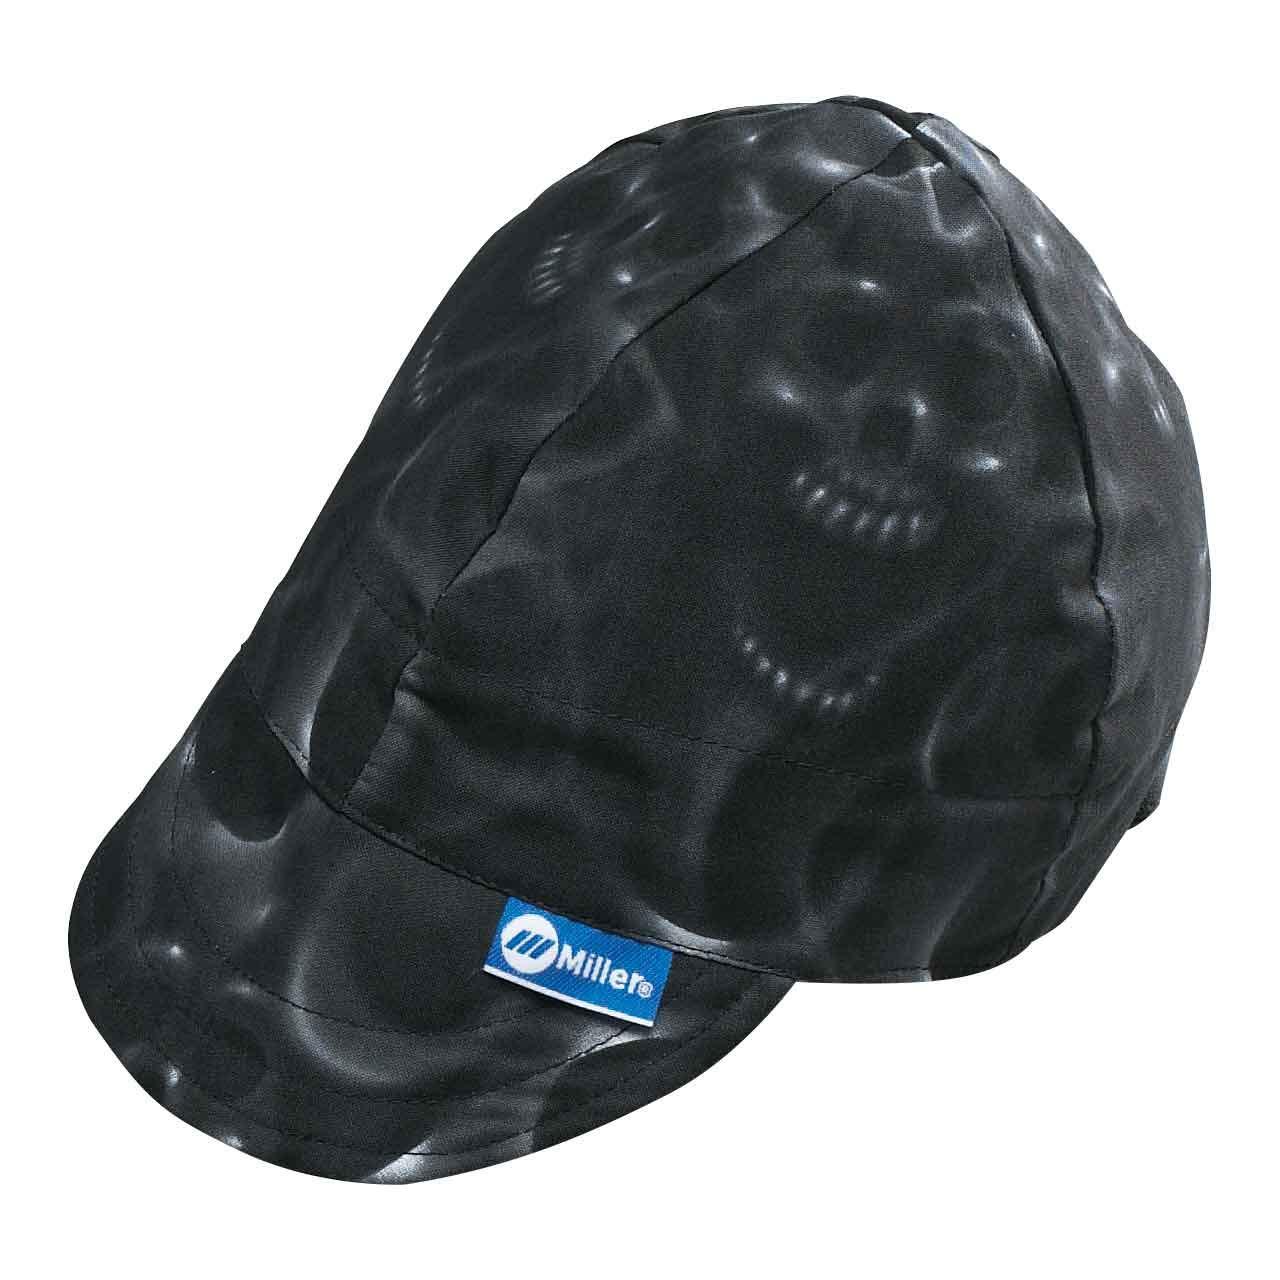 Miller Genuine Arc Armor Ghost Skulls Welding Cap 7-1/4'' - 230543